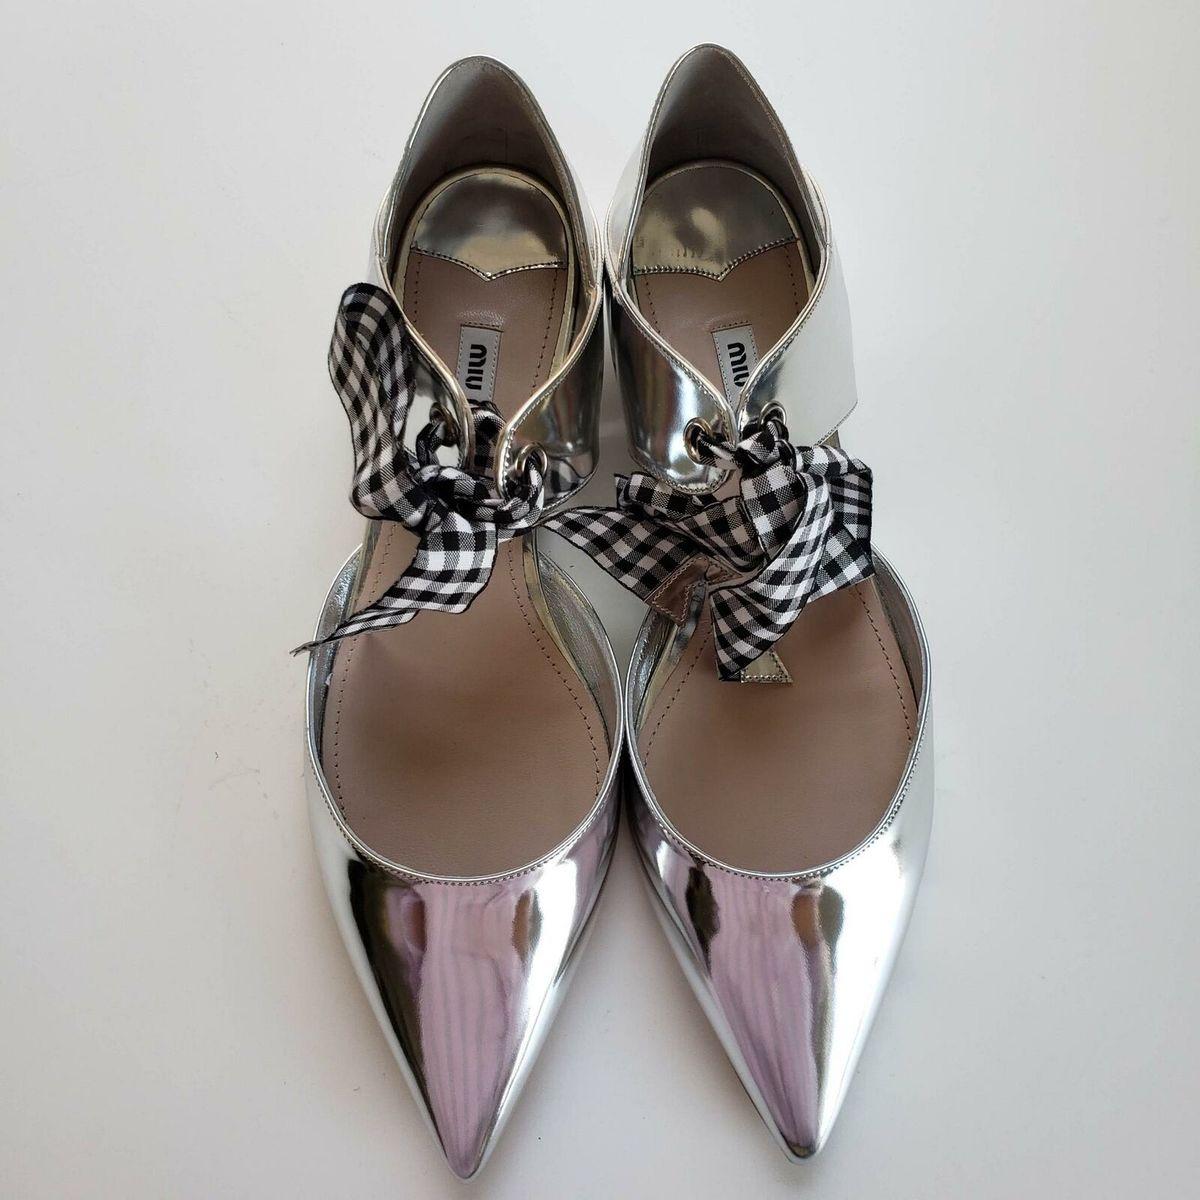 Miu Miu ミュウミュウ ポイントトゥ フラット バレリーナシューズ メタリックシルバー Pointed Toe Flat Ballerina Shoes Metallic Silver